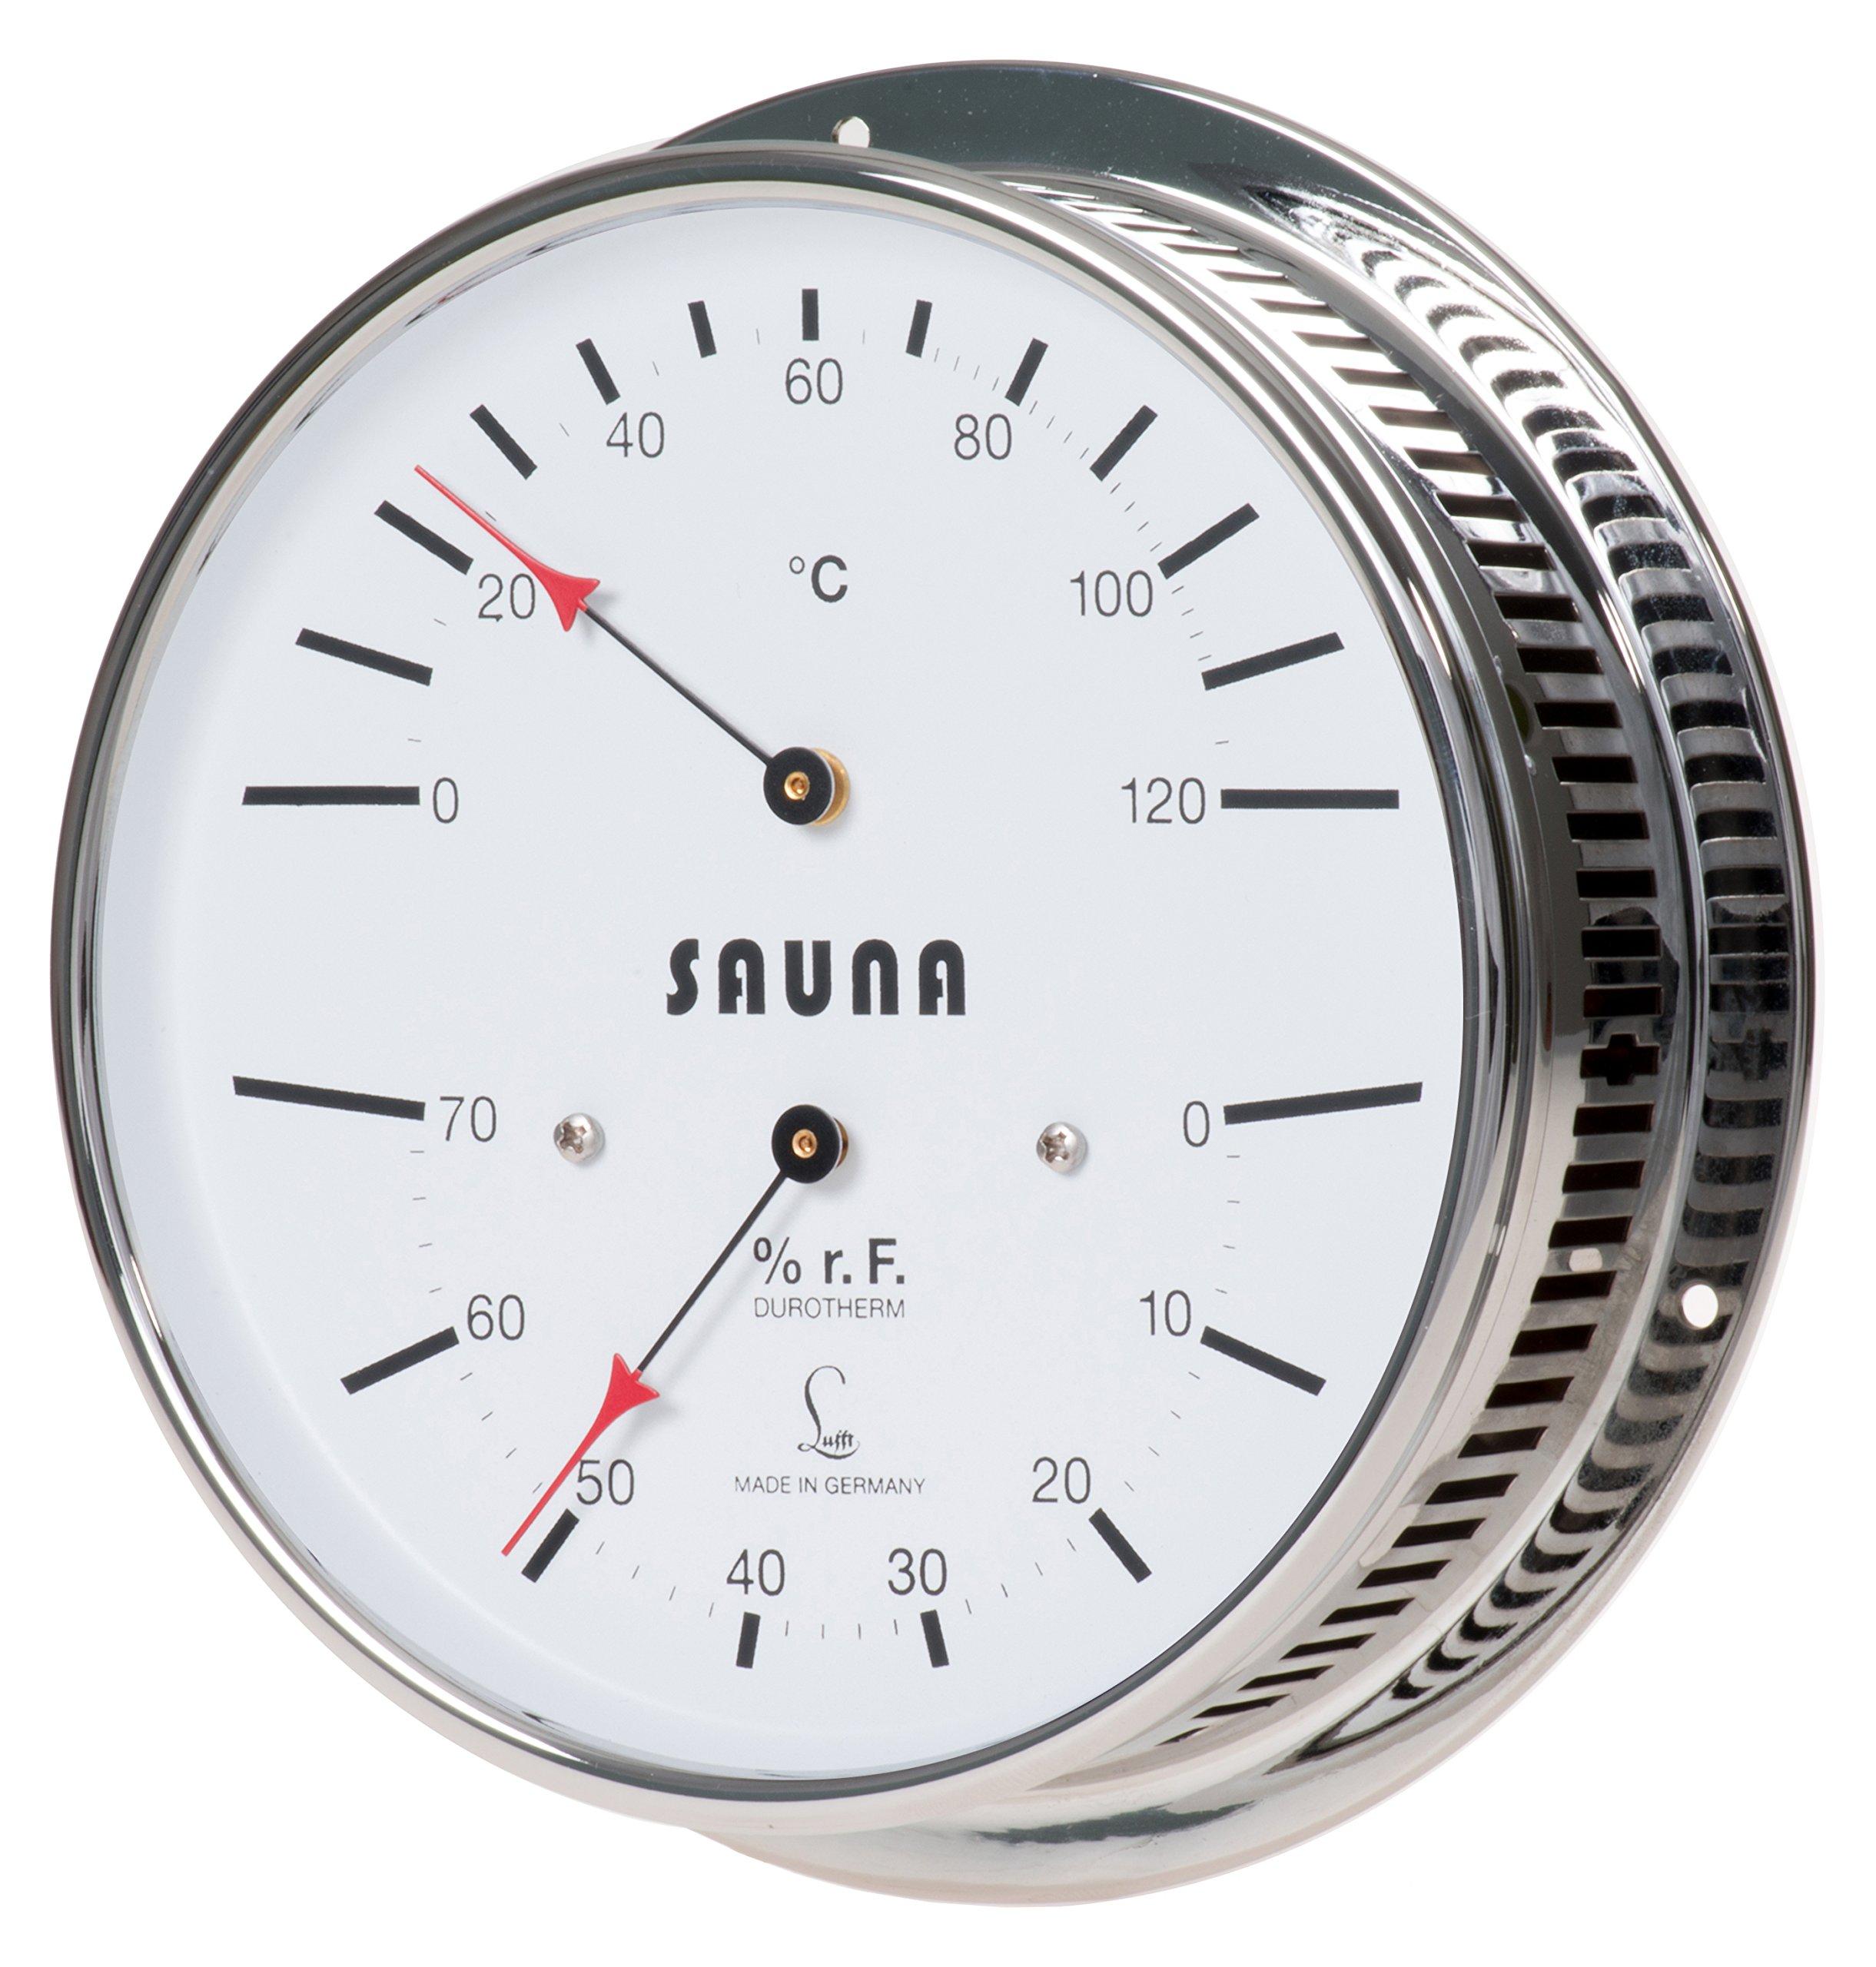 LUFFT Sauna Thermometer + Hygrometer 6.3'', Chromed Brass, 5030.00 (°C version)